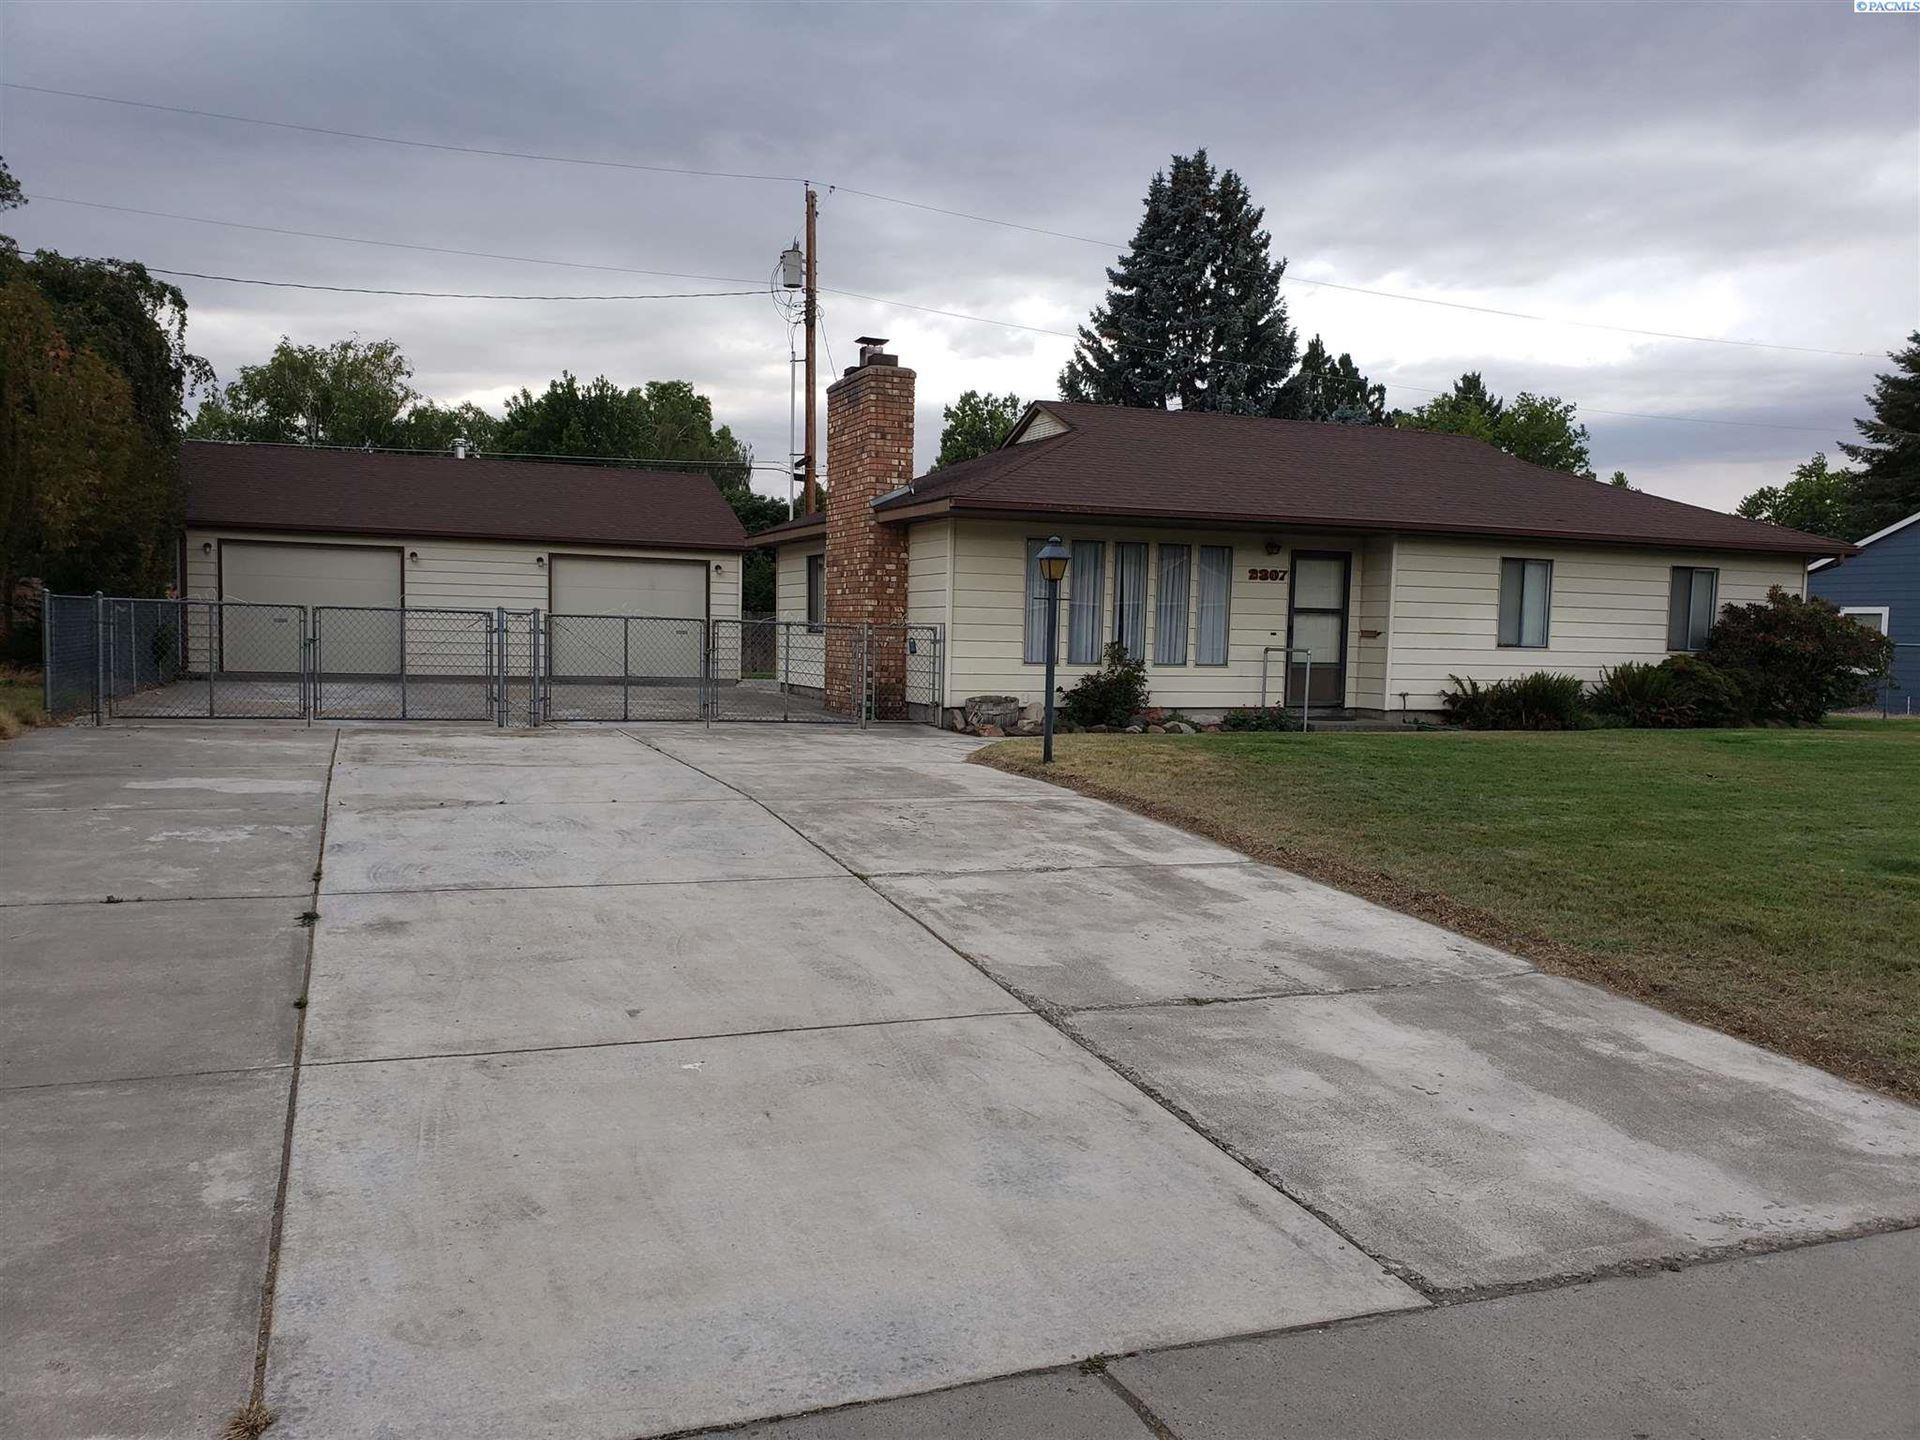 Photo of 2307 Torbett Street, Richland, WA 99354 (MLS # 254371)